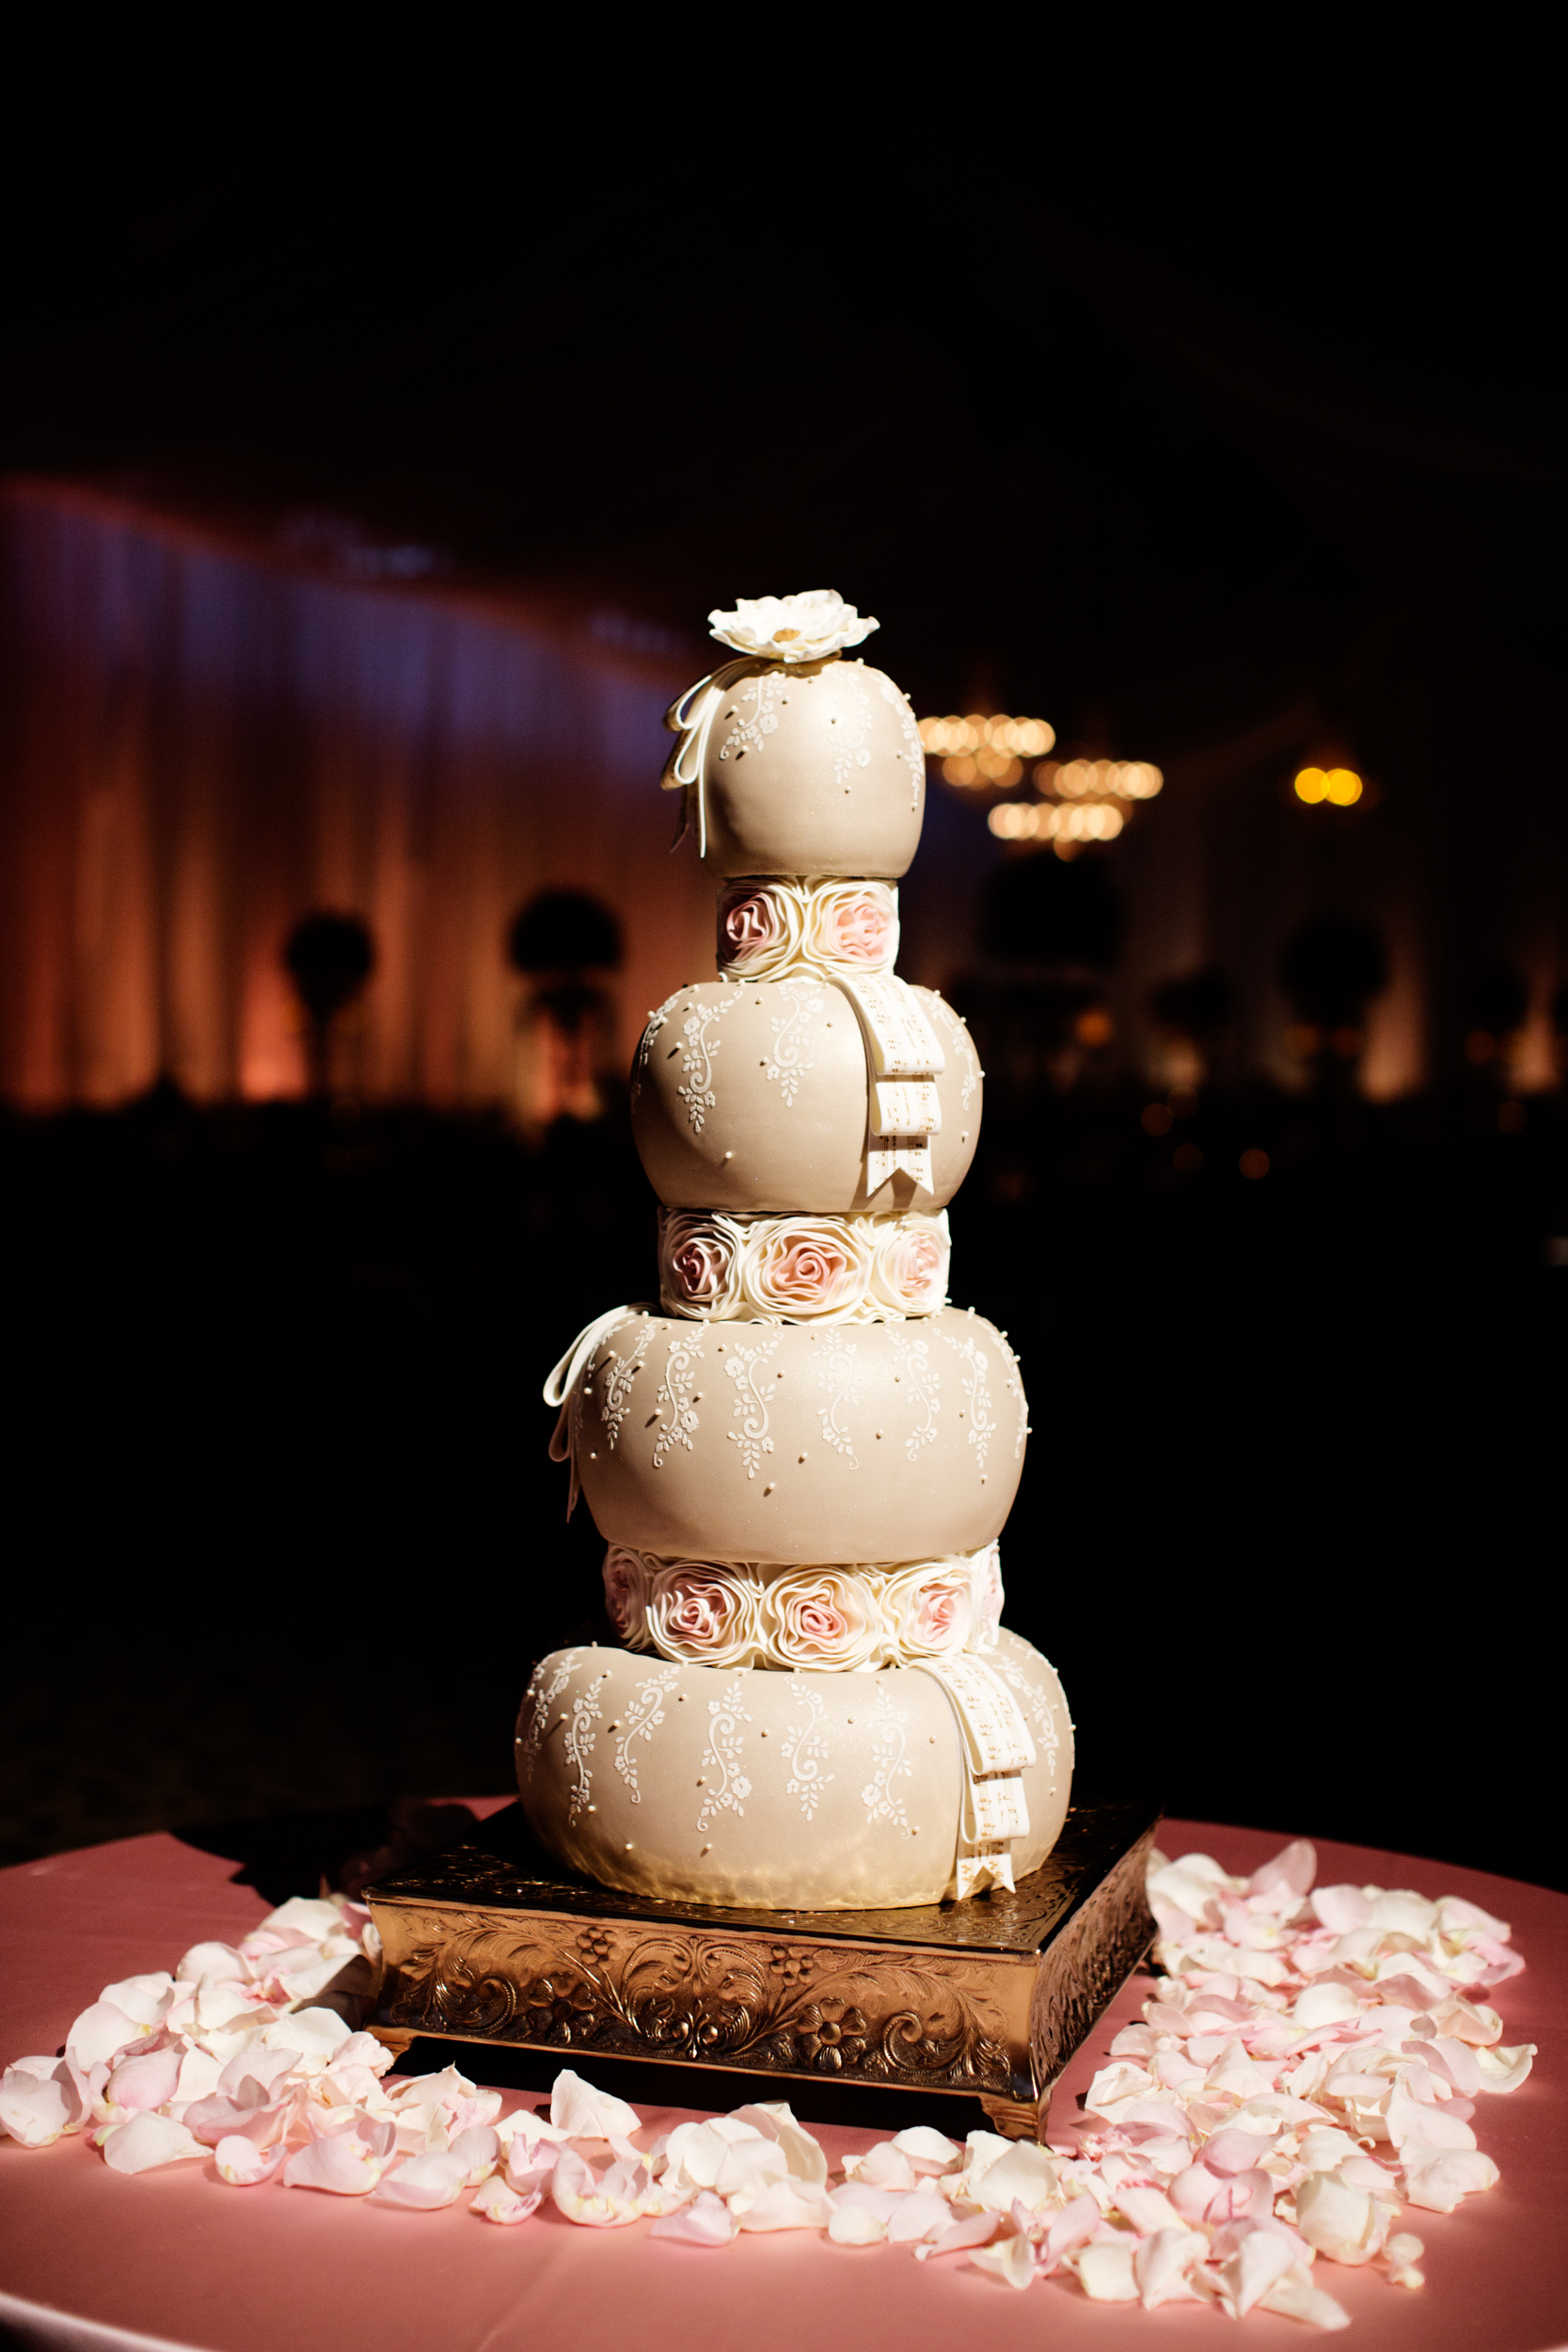 Ceci_New_York_Ceci_Style_Ceci_Johnson_Luxury_Lifestyle_Floral_Lace_Wedding_Letterpress_Inspiration_Design_Custom_Couture_Personalized_Invitations_-17.jpg